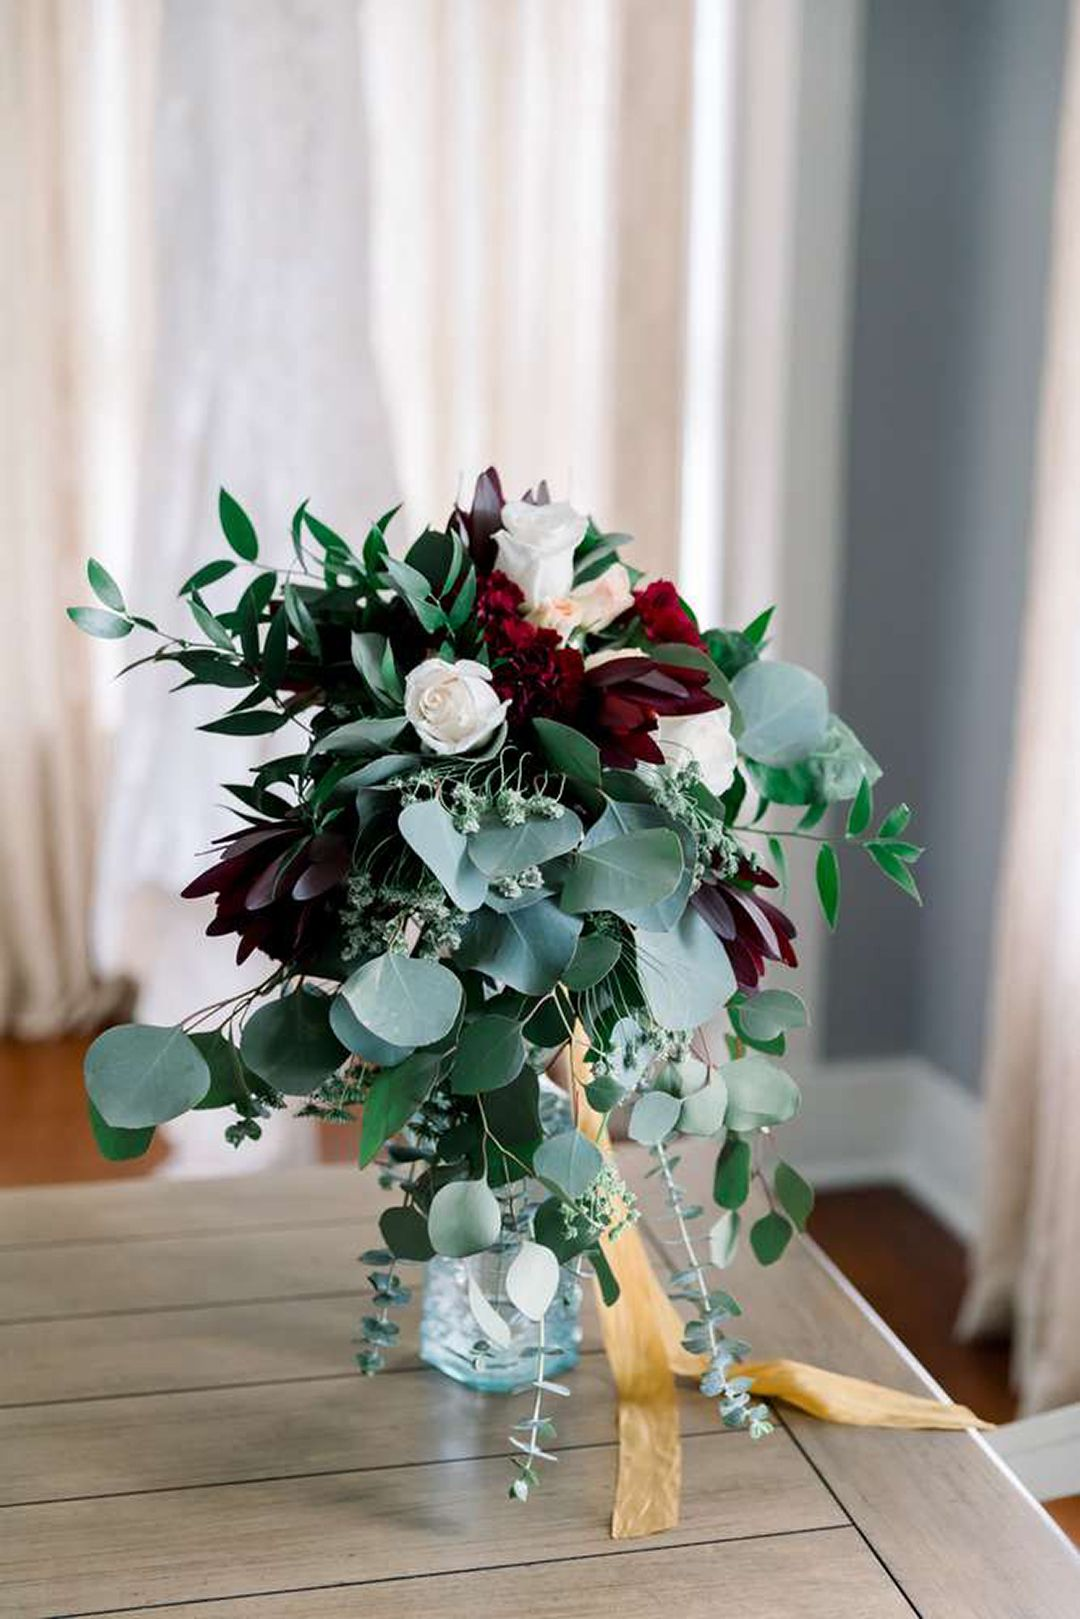 Burgandy Winter Bouquet Online Wedding Flowers Bulk Wedding Flowers Diy Wedding Bouquet